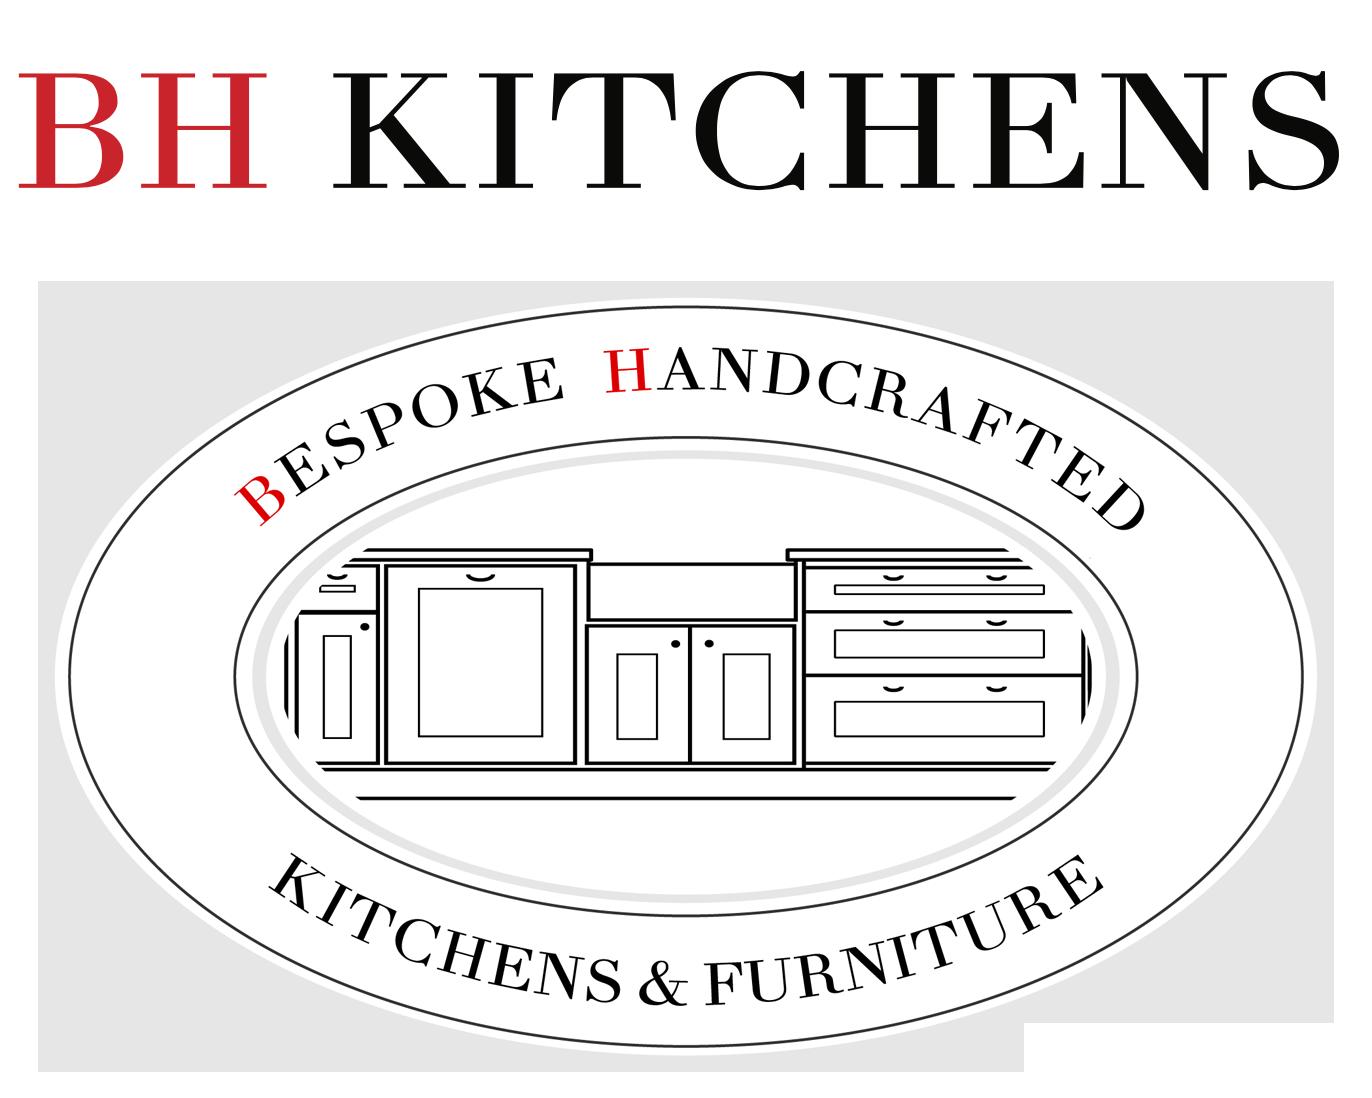 BH Kitchens logo